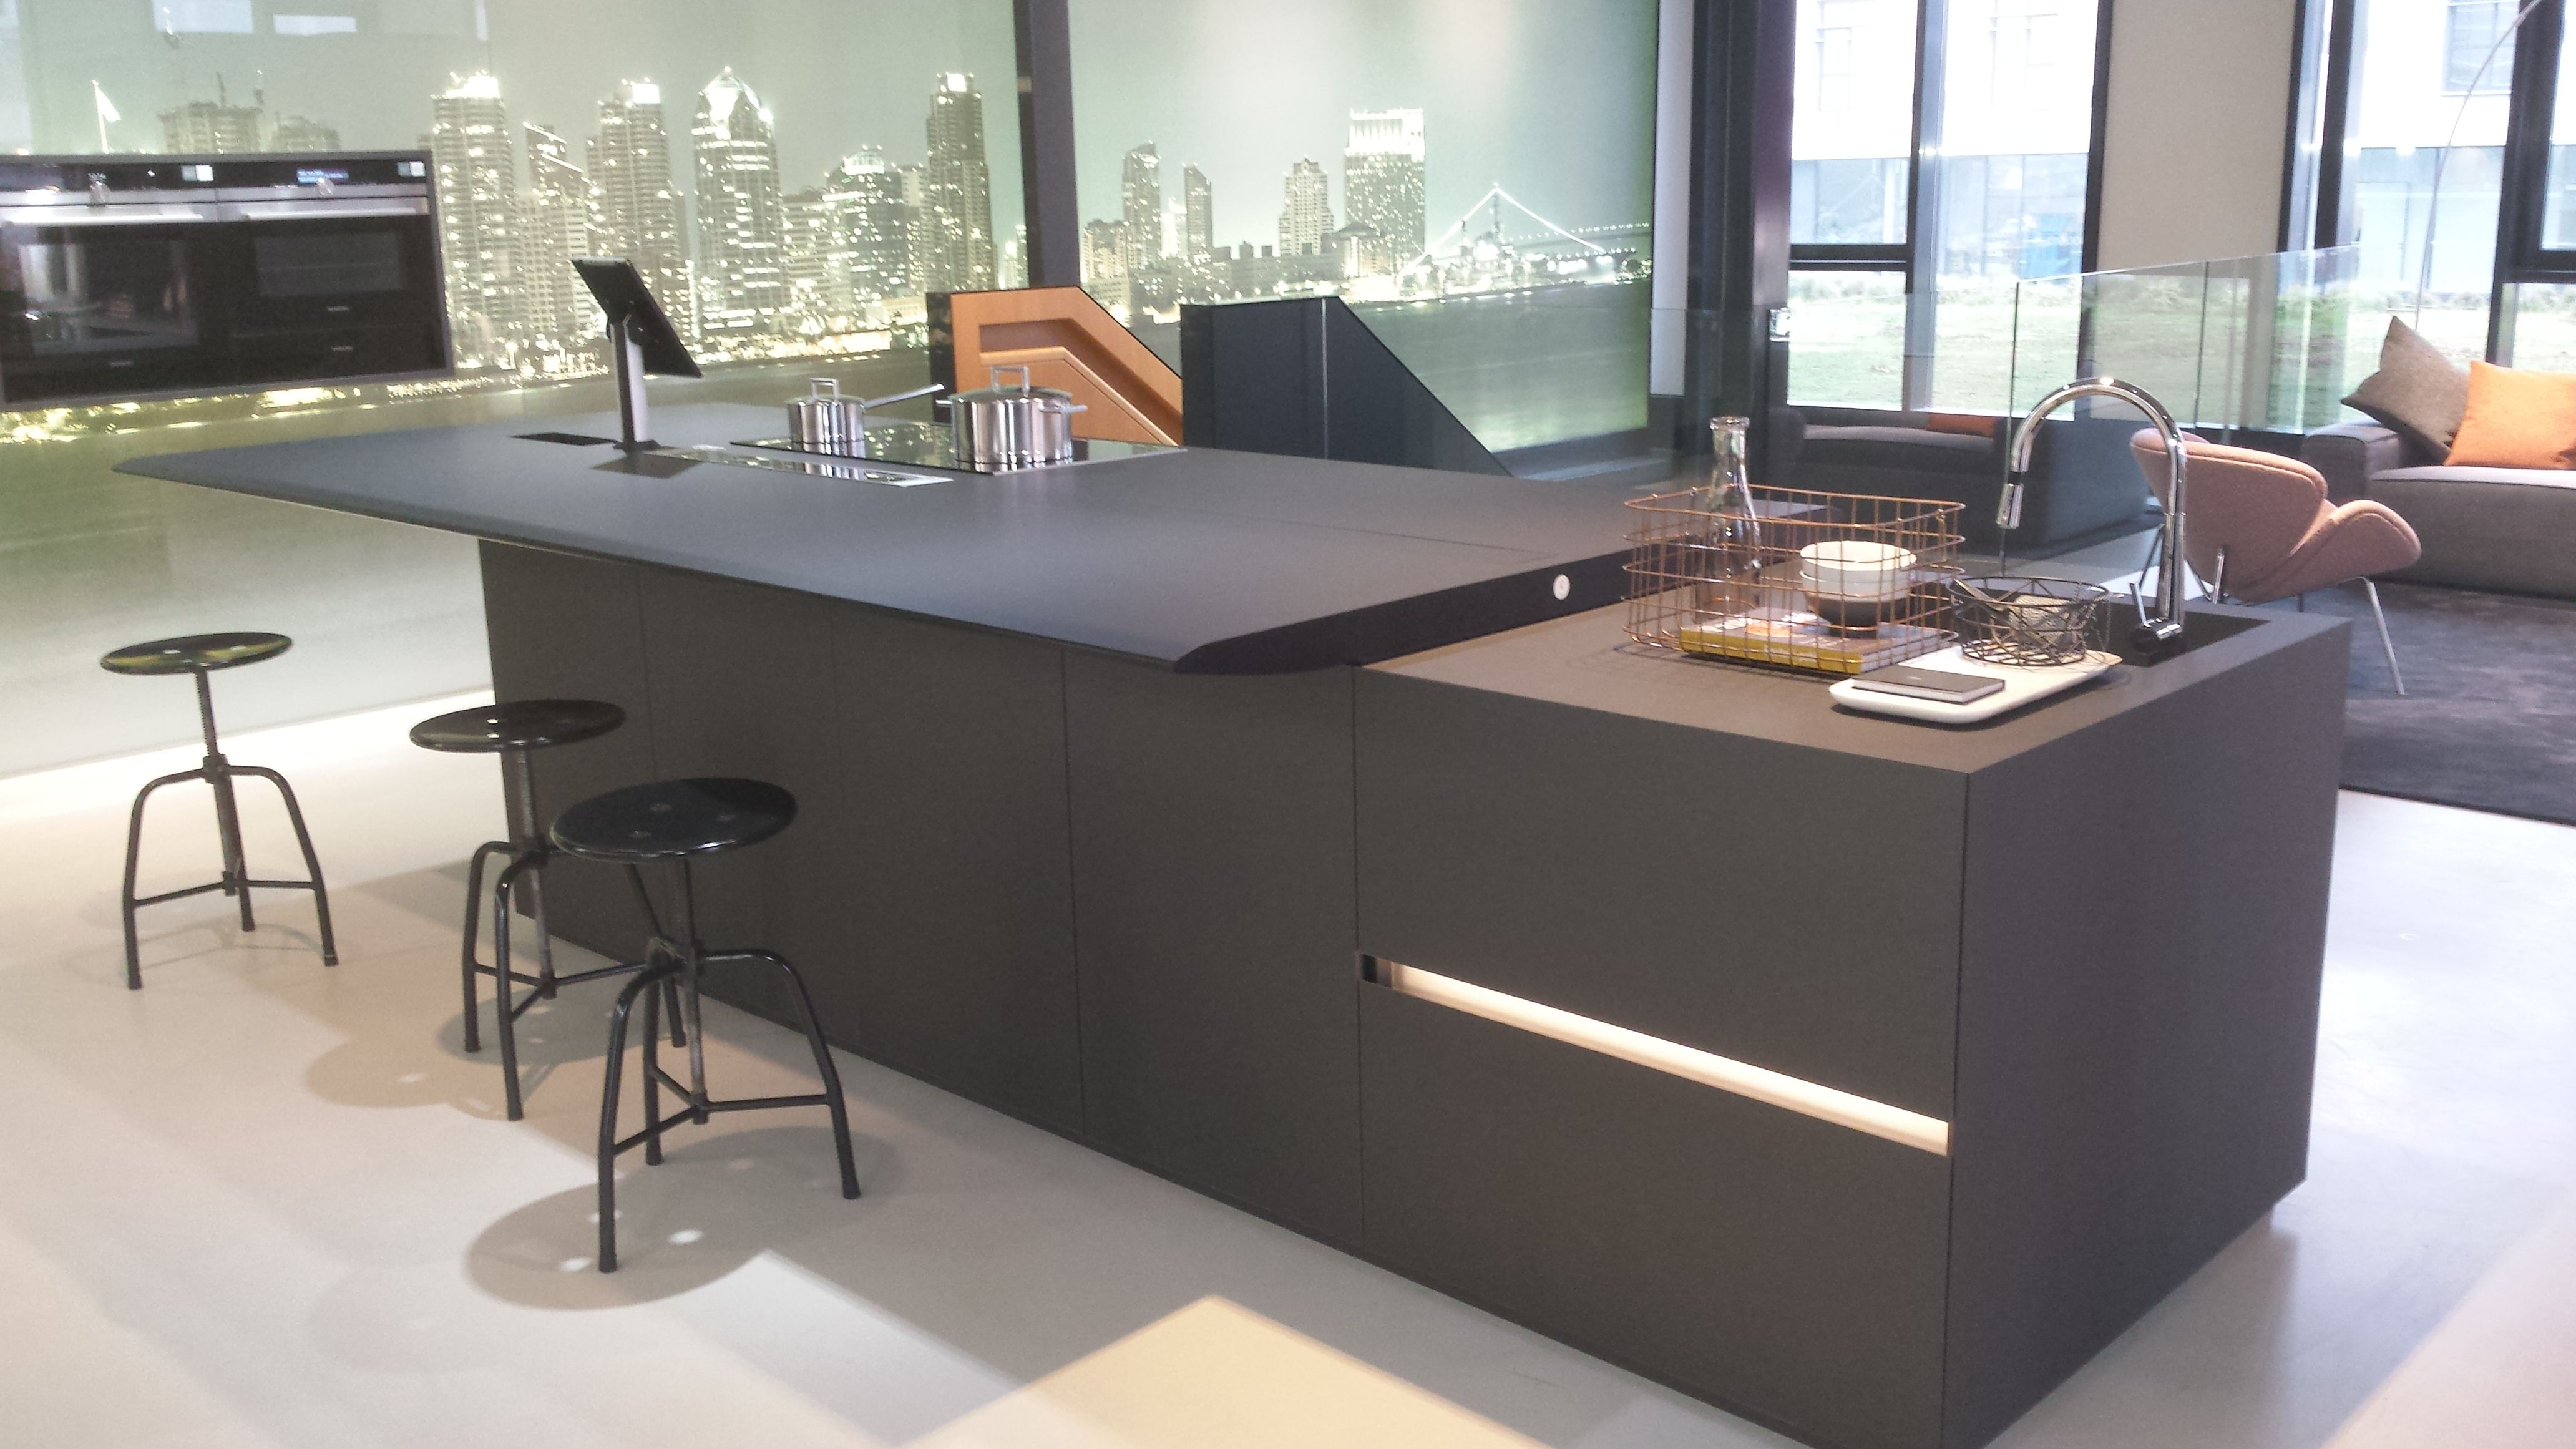 Tavolo Fenix ~ Siemens showroom. hoofddorp the netherlands. architect: ddock